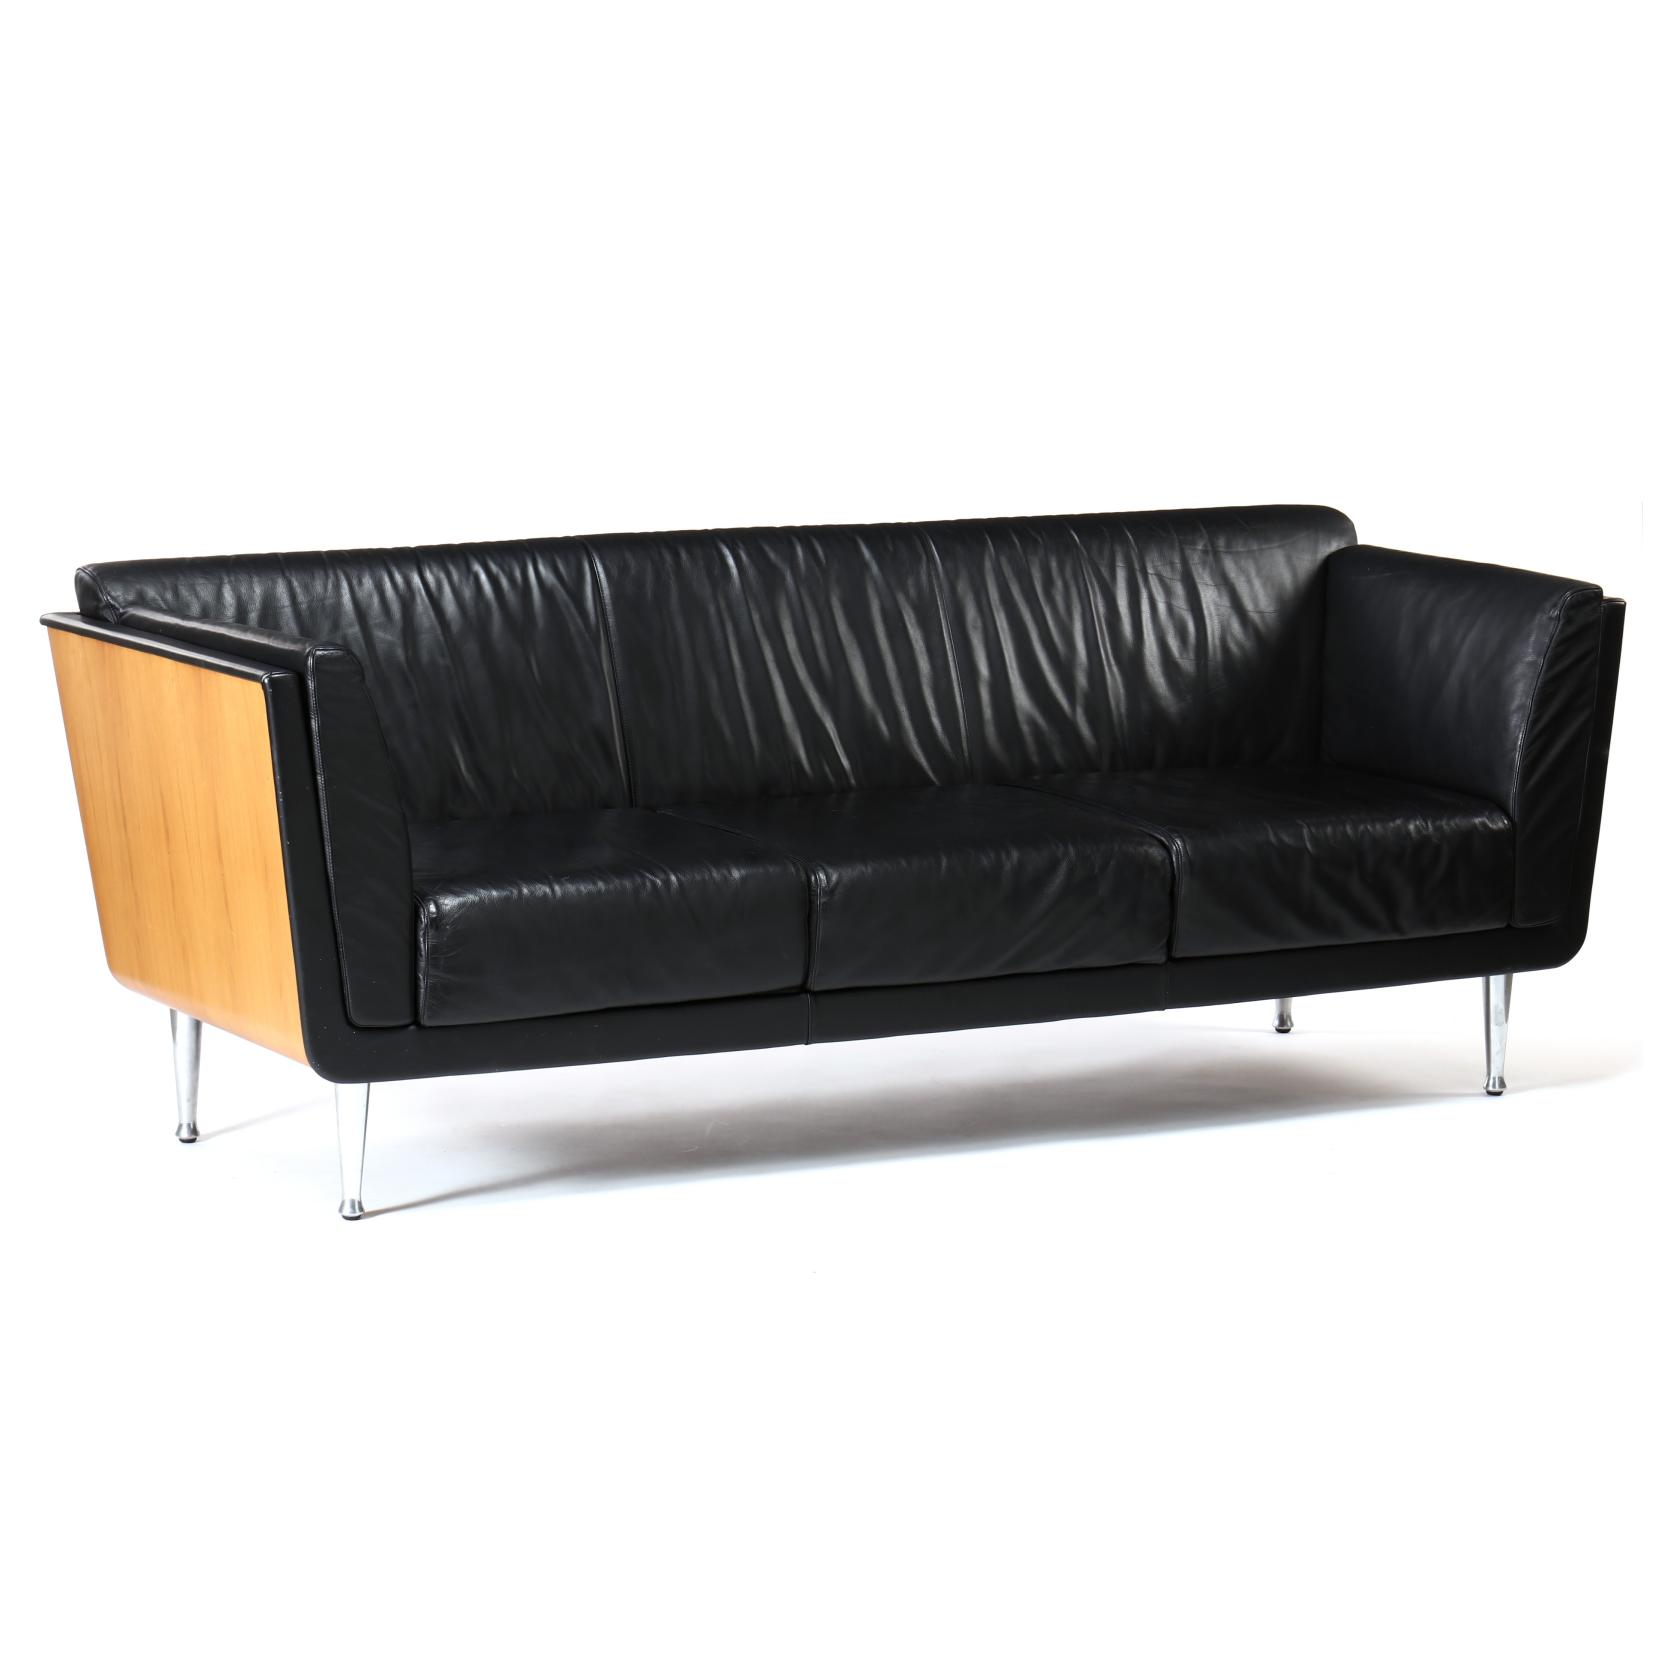 herman-miller-i-goetz-i-leather-sofa